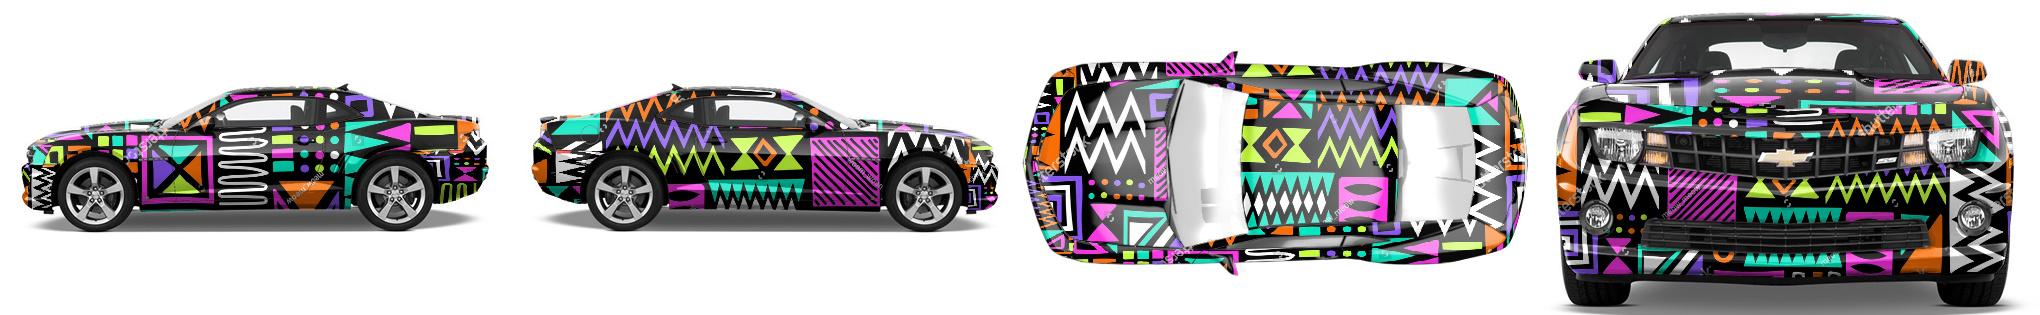 Muscle Car Wrap #52663